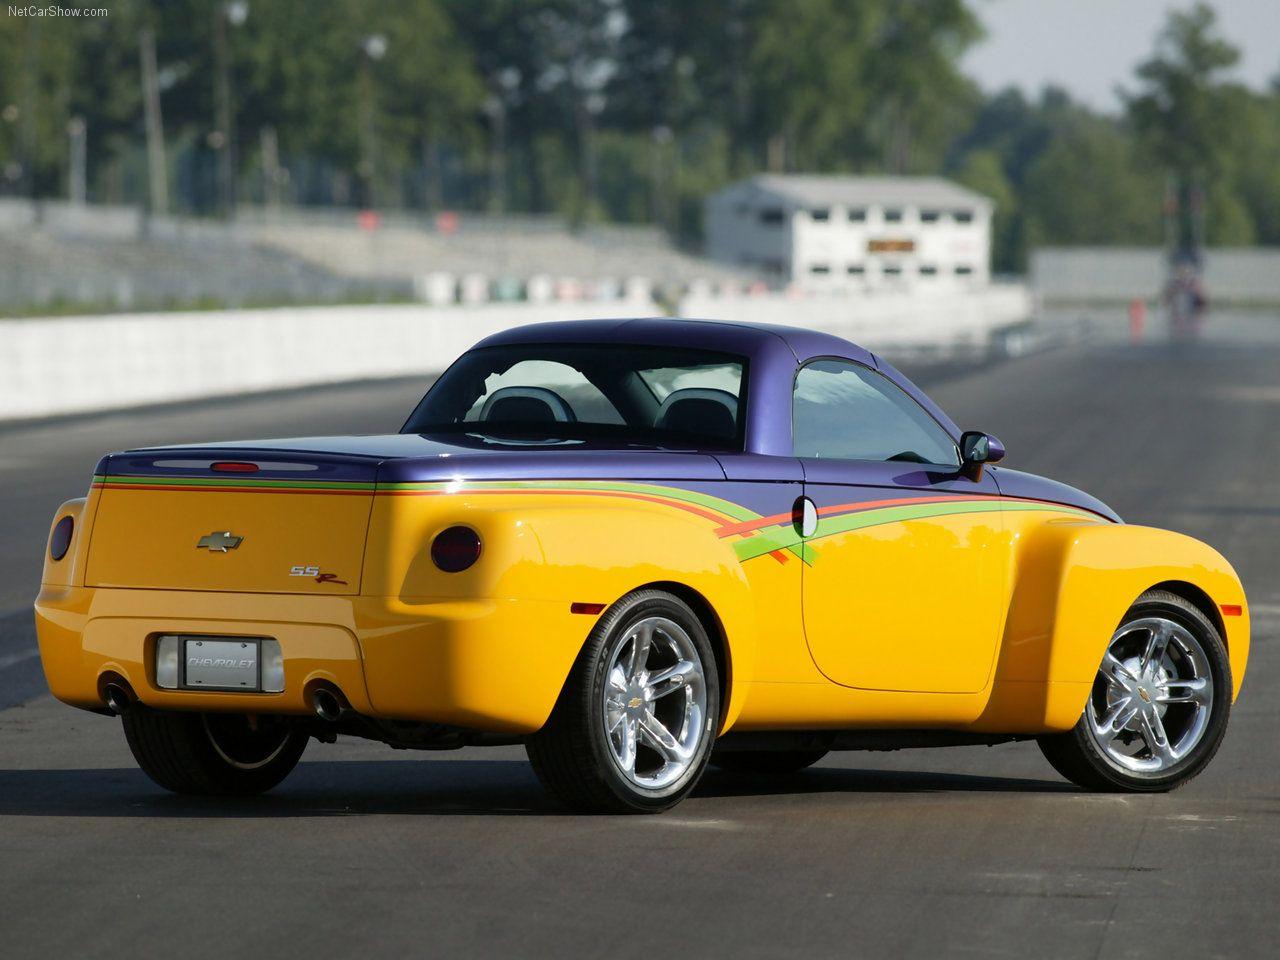 2003 Chevrolet Ssr Hot Rod Power Tour Concept Trucks Cars For